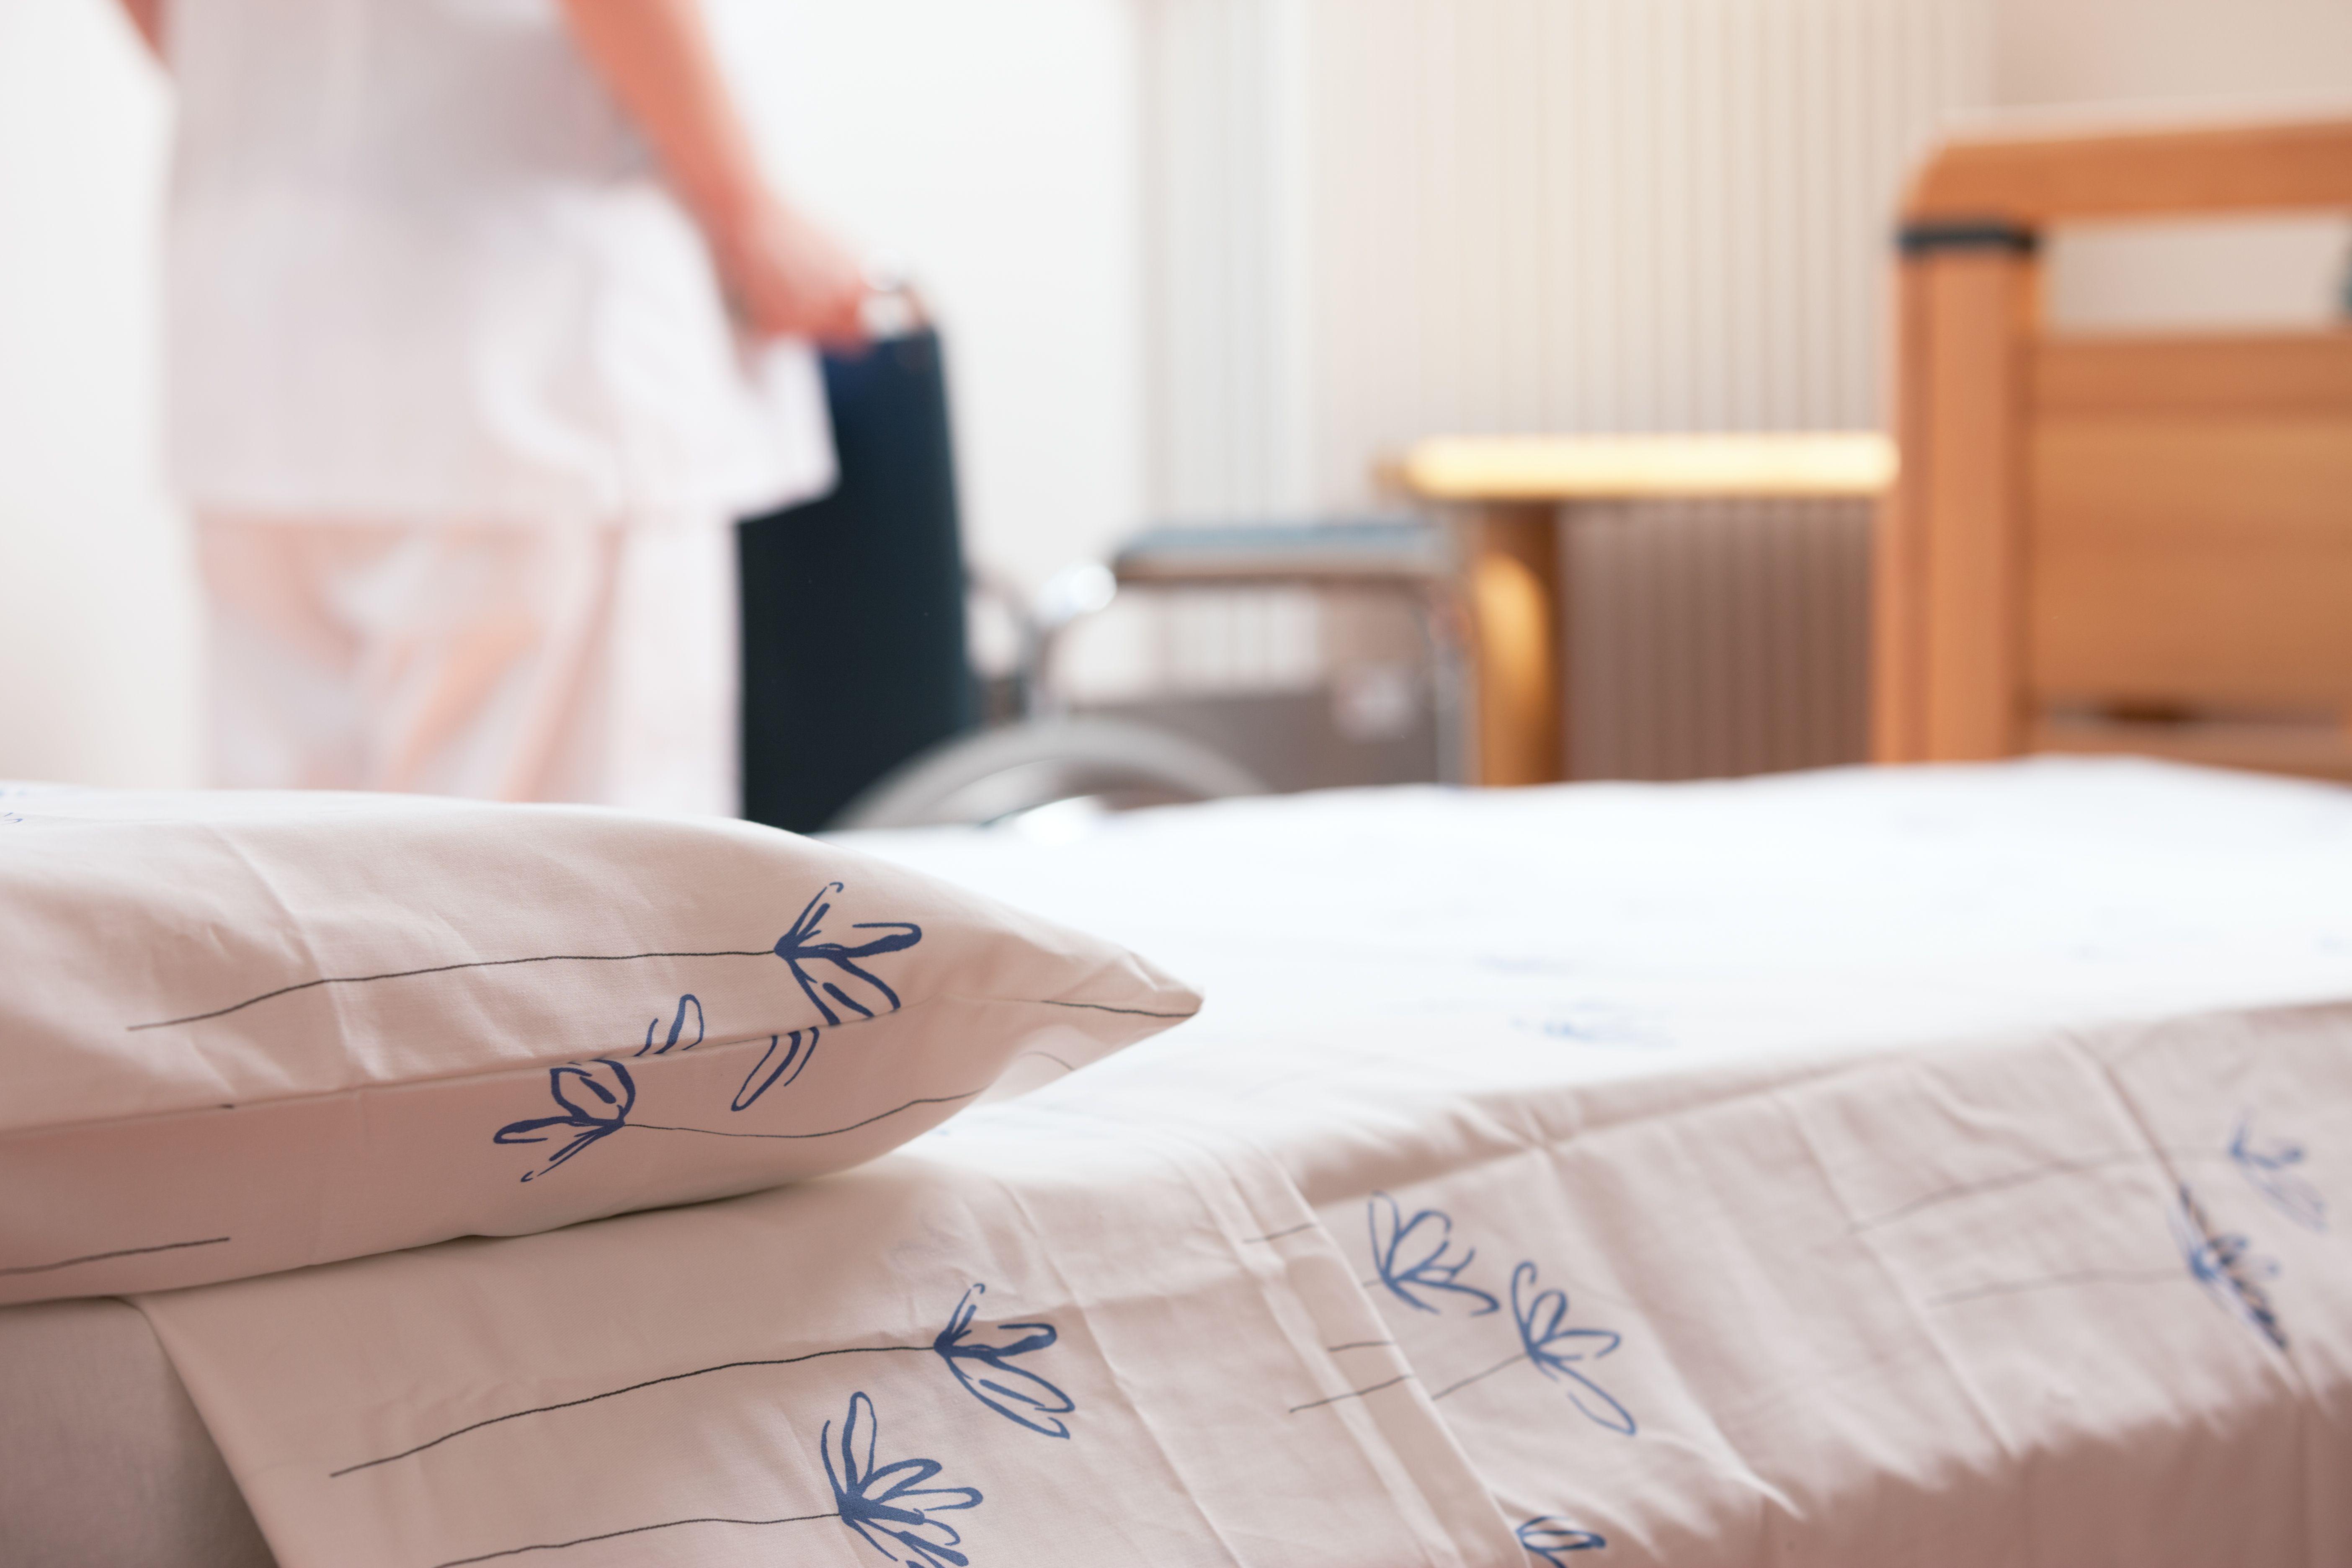 Servicio hospitalario: Servicios de Avis a Casa